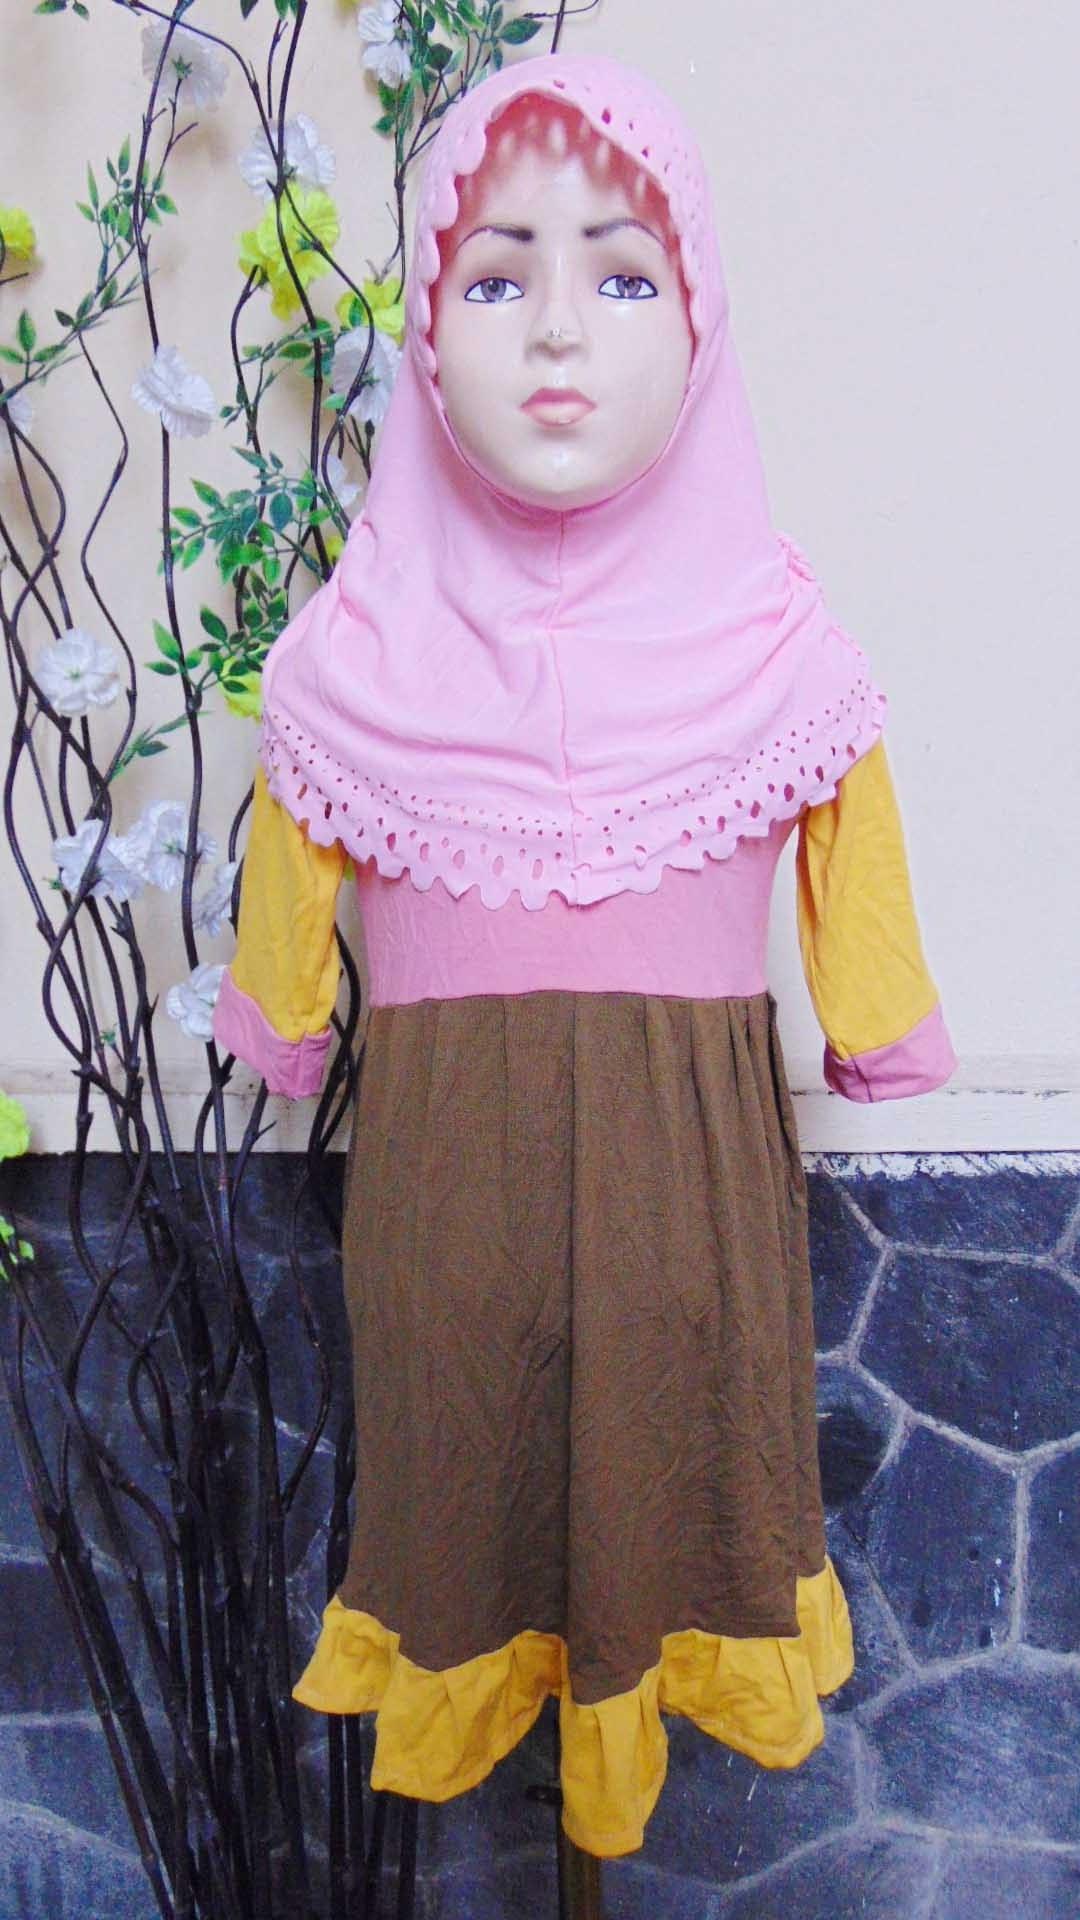 Ide Baju Lebaran Bayi Perempuan Dwdk Plus Jilbab Baju Lebaran Muslimah Gamis Bayi Perempuan